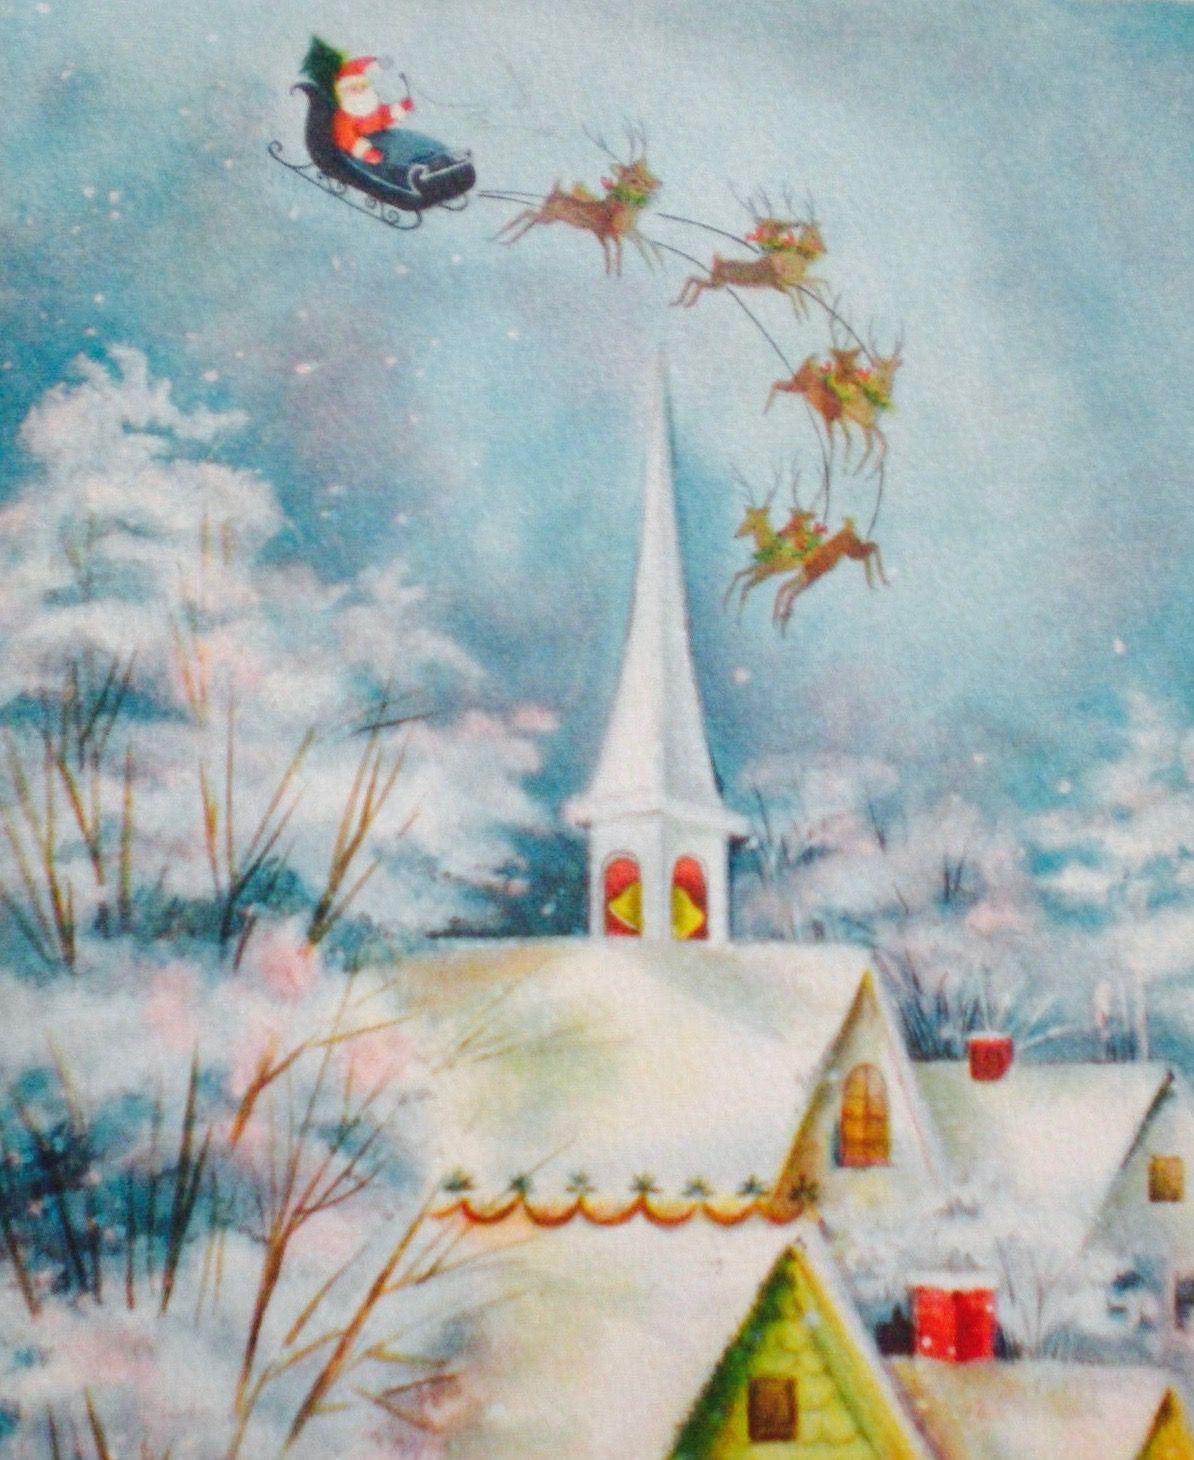 Santa's Special Delivery. Vintage Christmas Card. Retro Christmas Card. Santa & Reindeer.